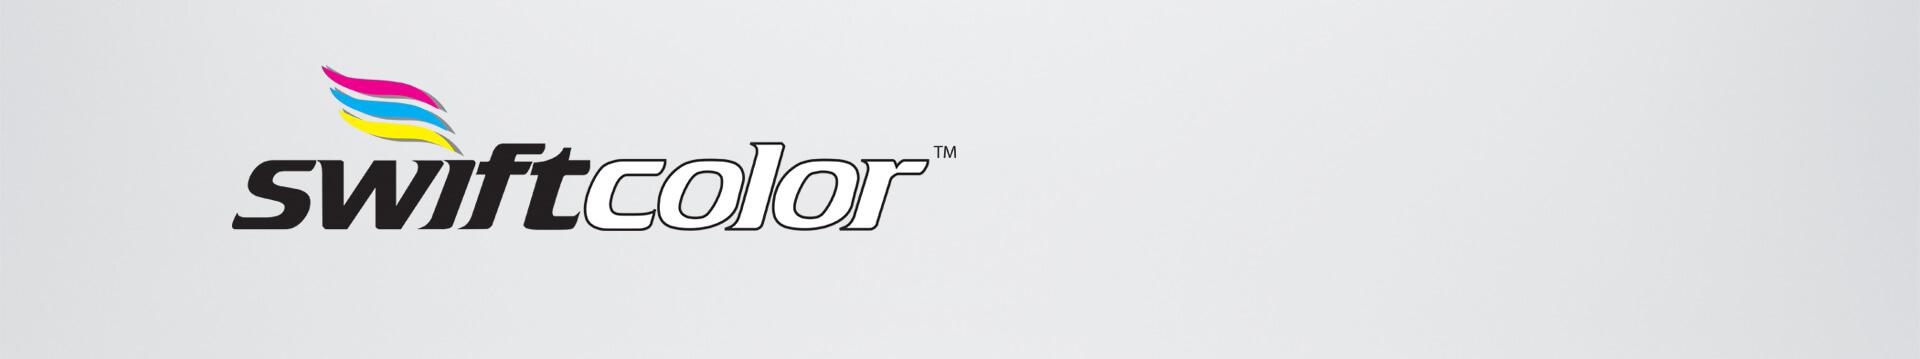 SwiftColor Hersteller Logo